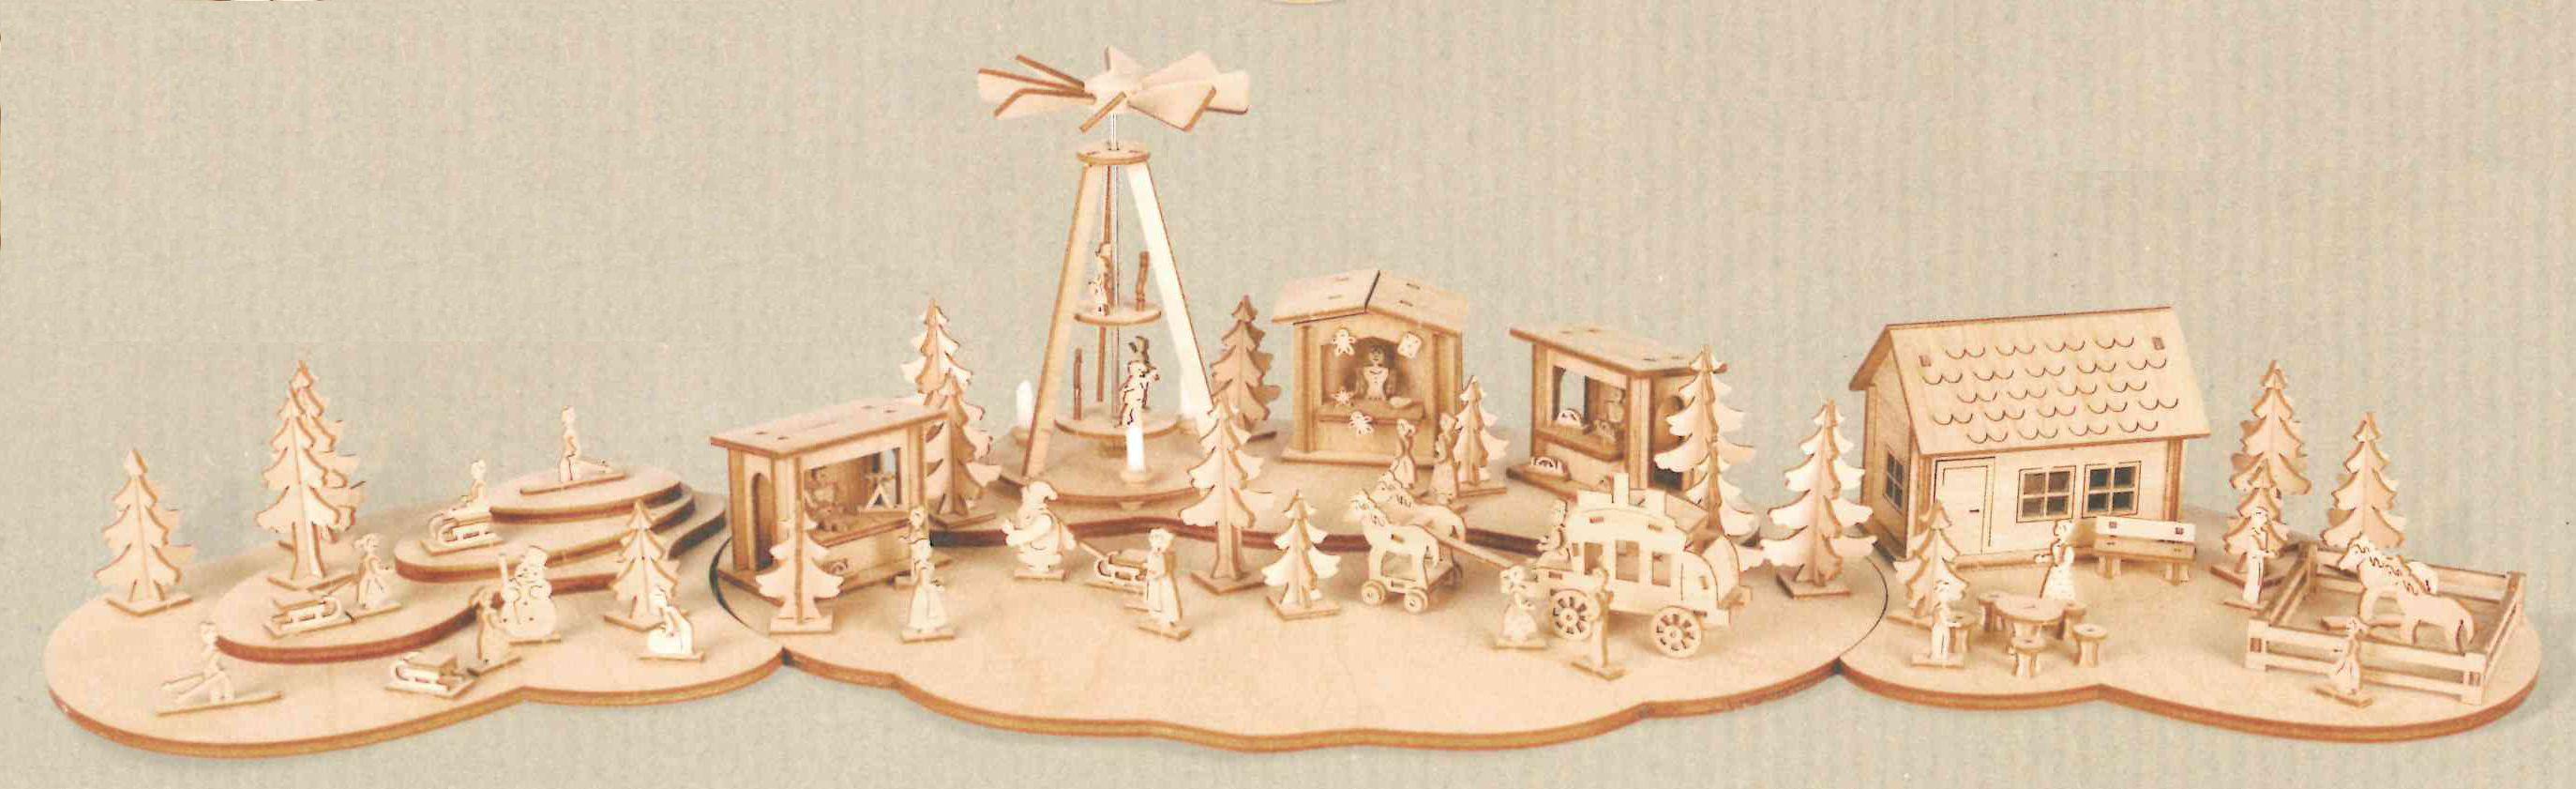 Miniatur Komplett Set Weihnachtsmarkt **Neu 2015**